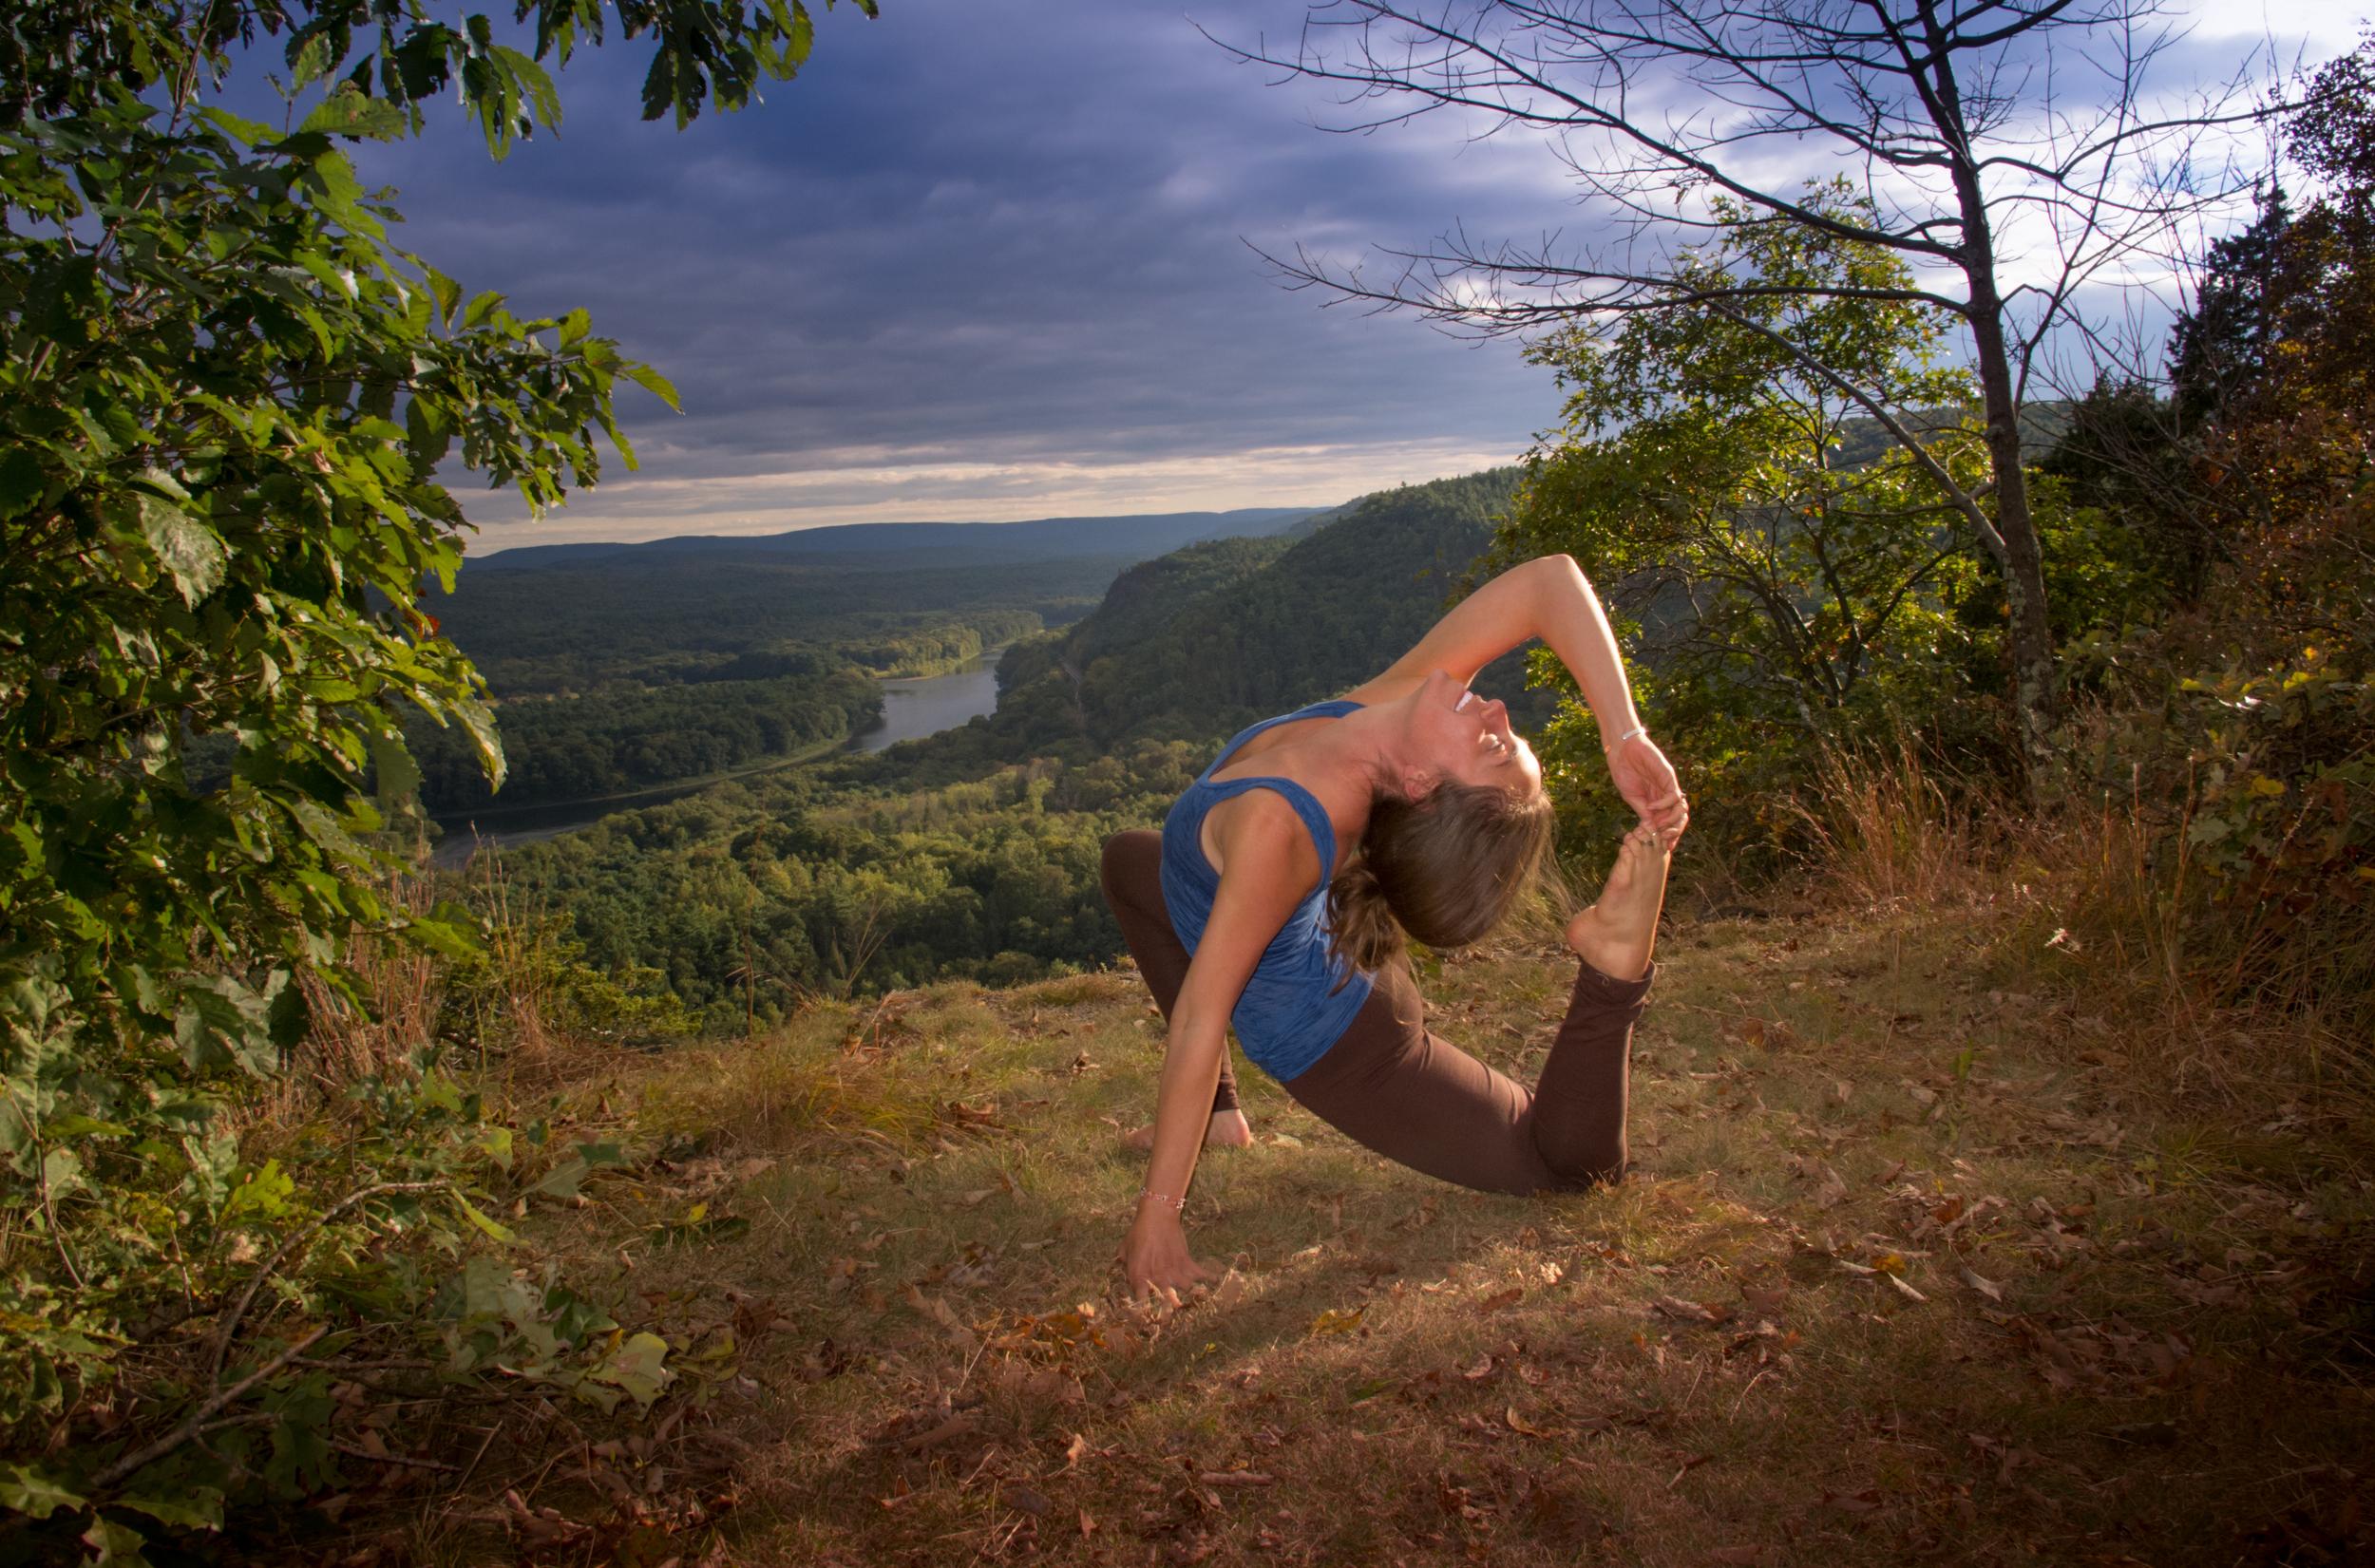 130922_ CliffTrail_Yoga_Kessiah_03-3.jpg